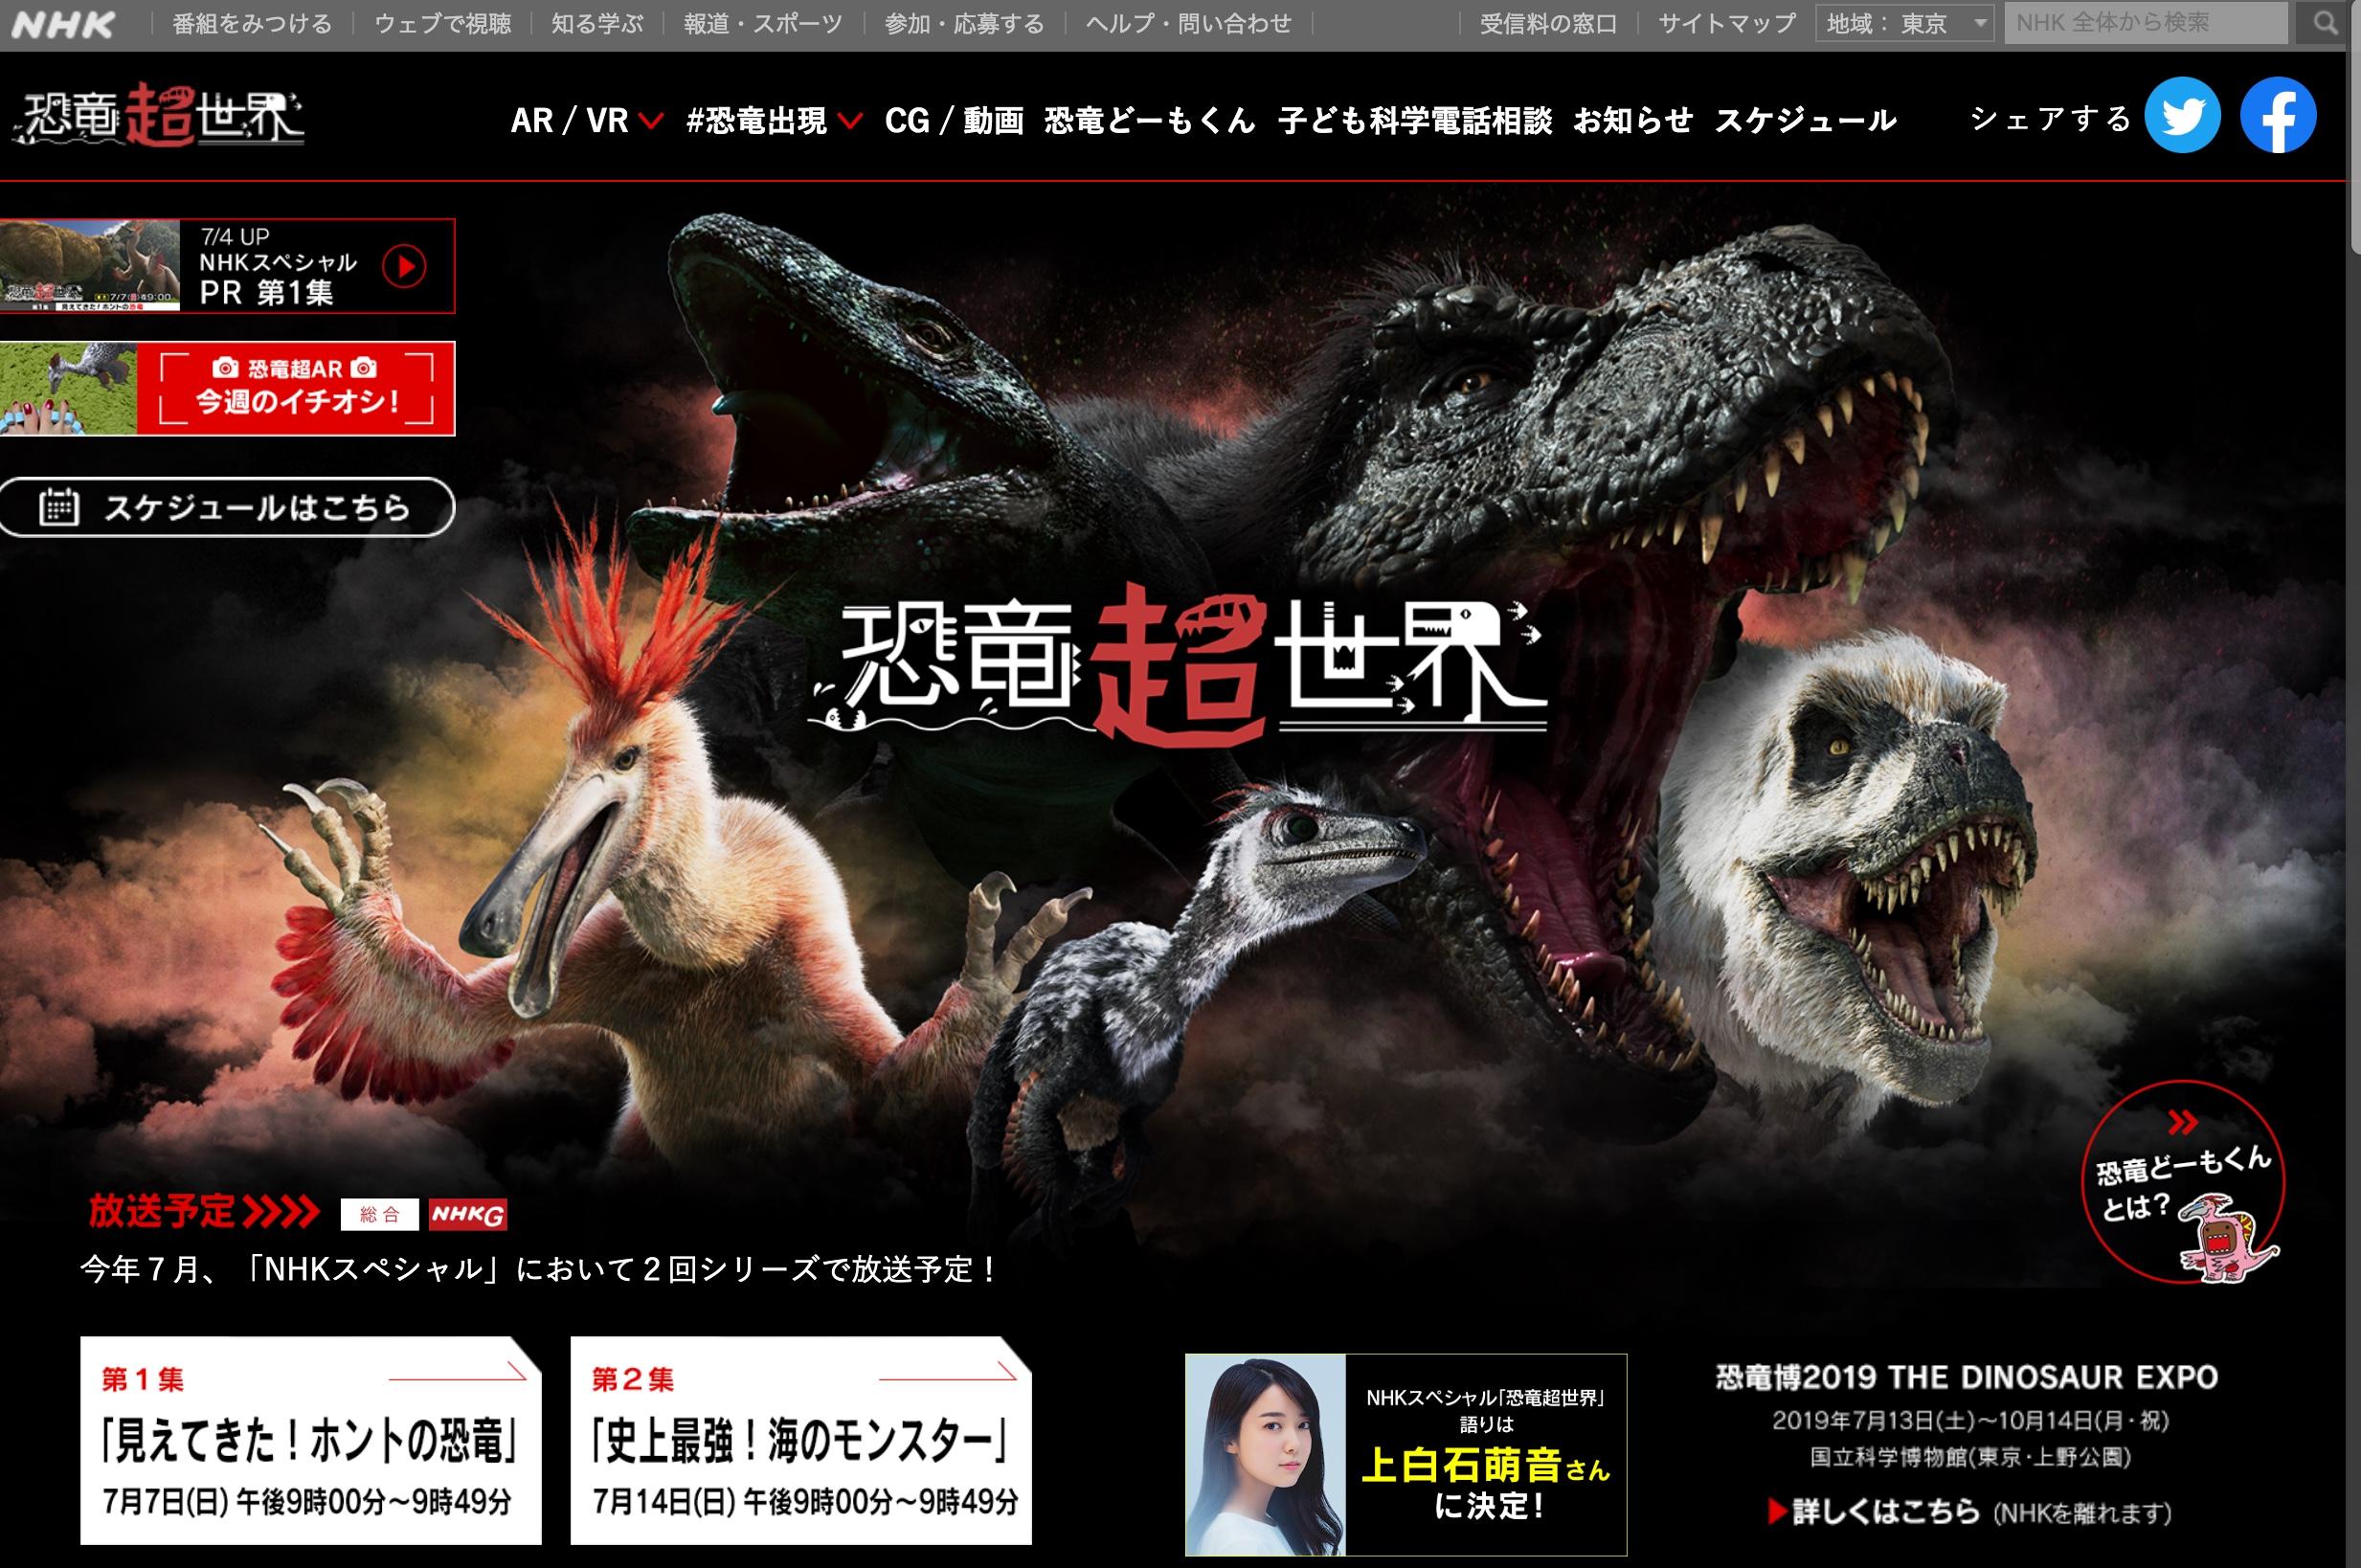 nhk スペシャル 恐竜 超 世界